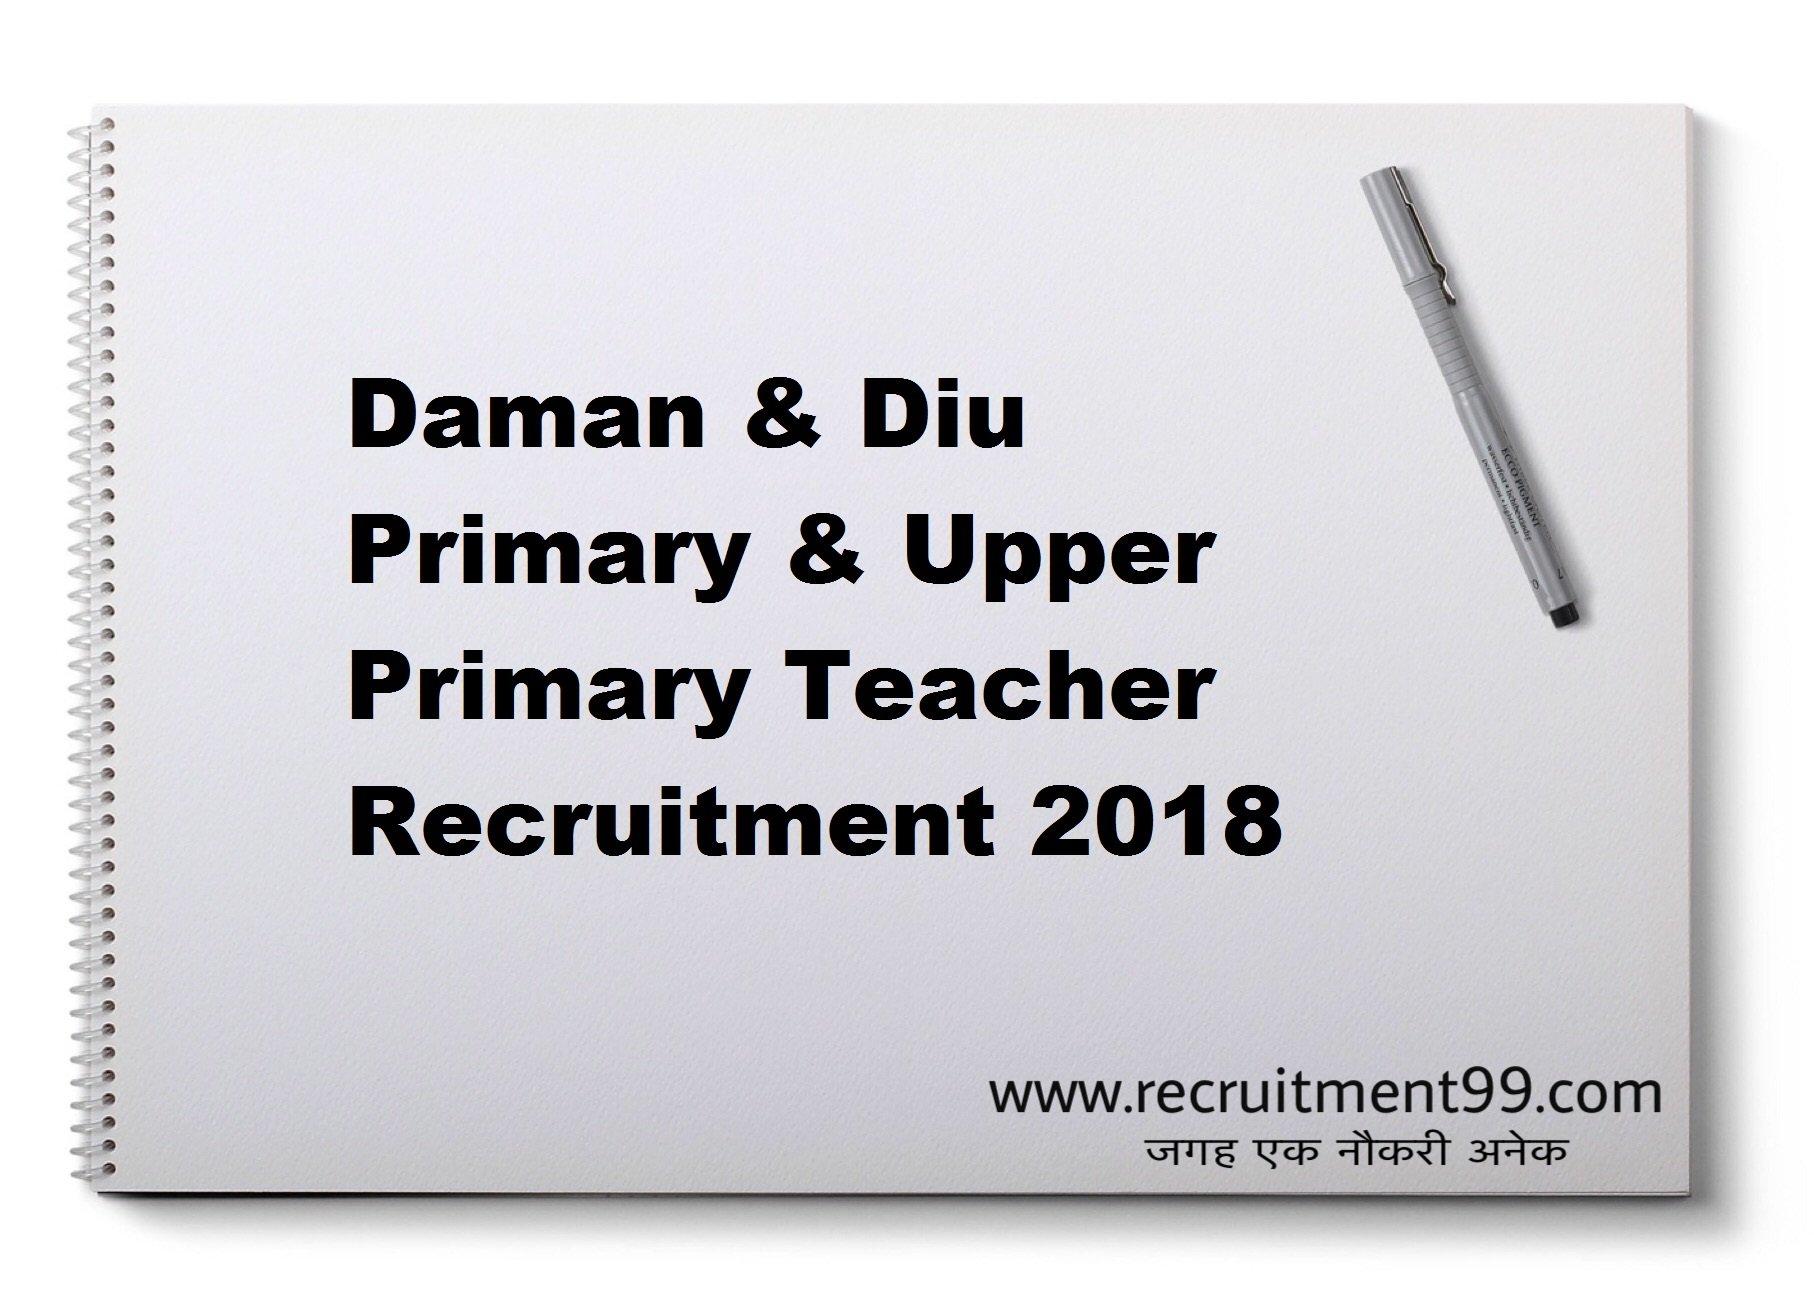 Daman & Diu Primary & Upper Primary Teacher Recruitment Admit Card Result 2018